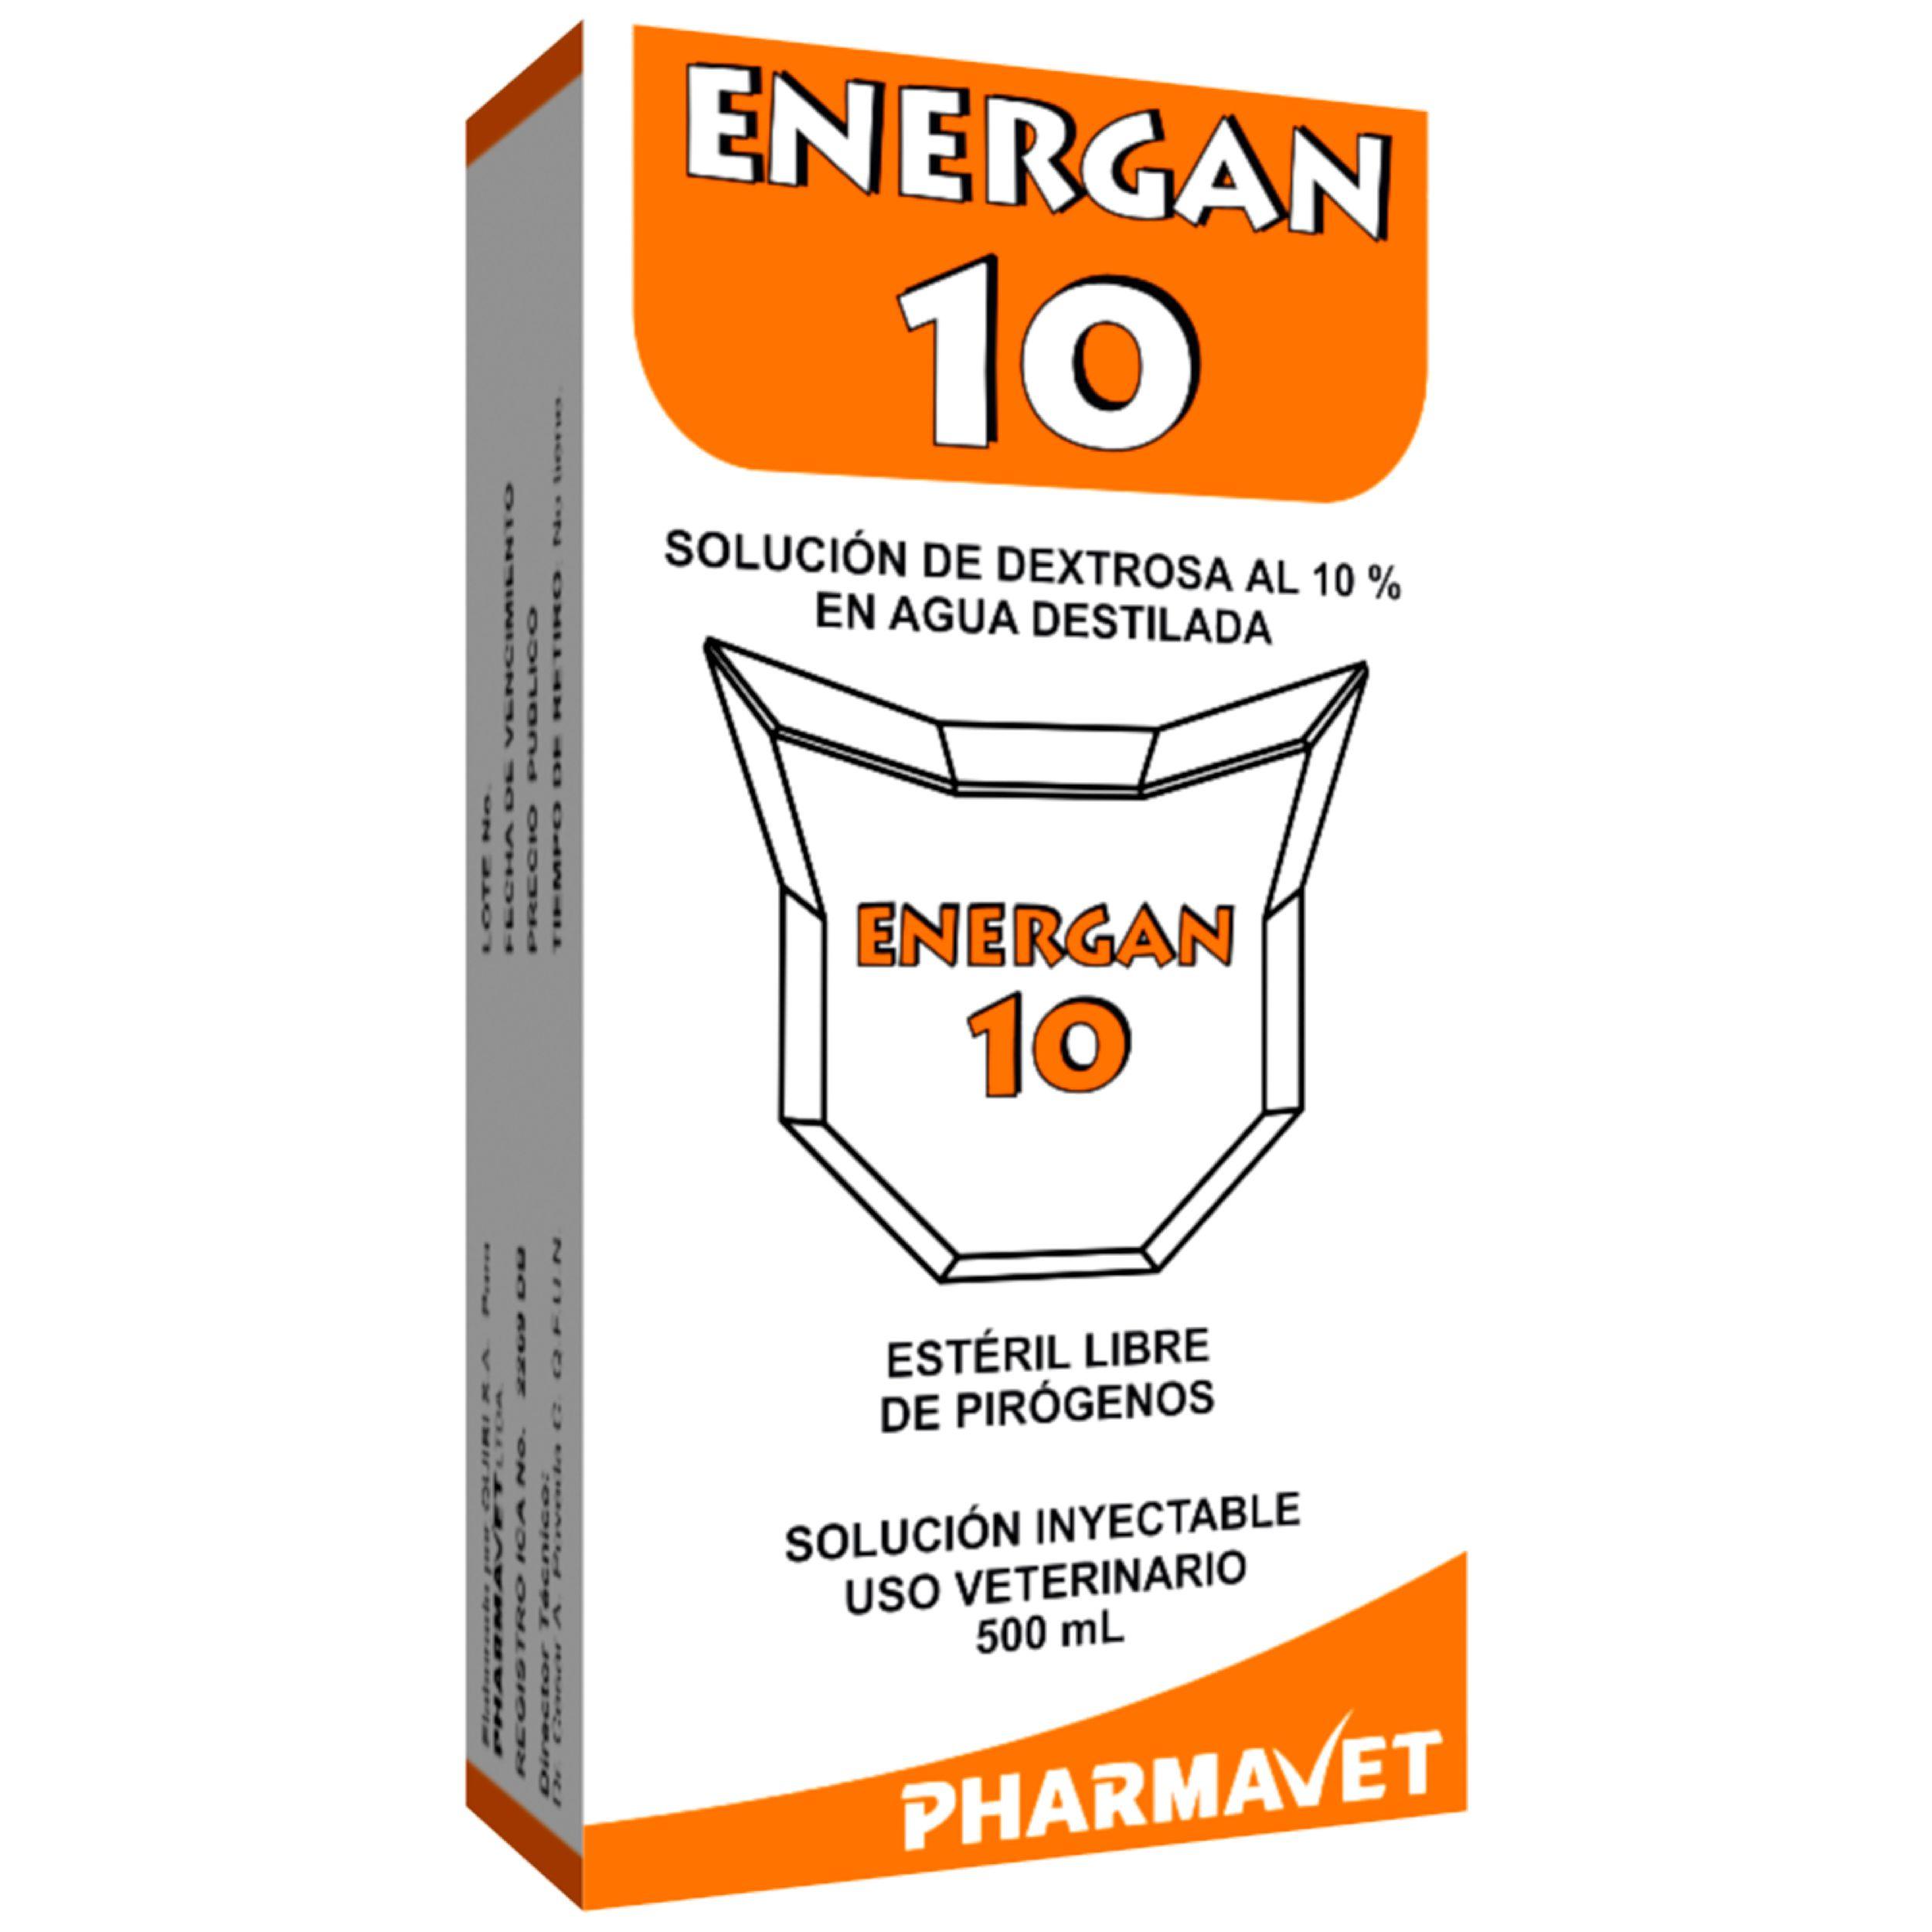 Energan10.jpg